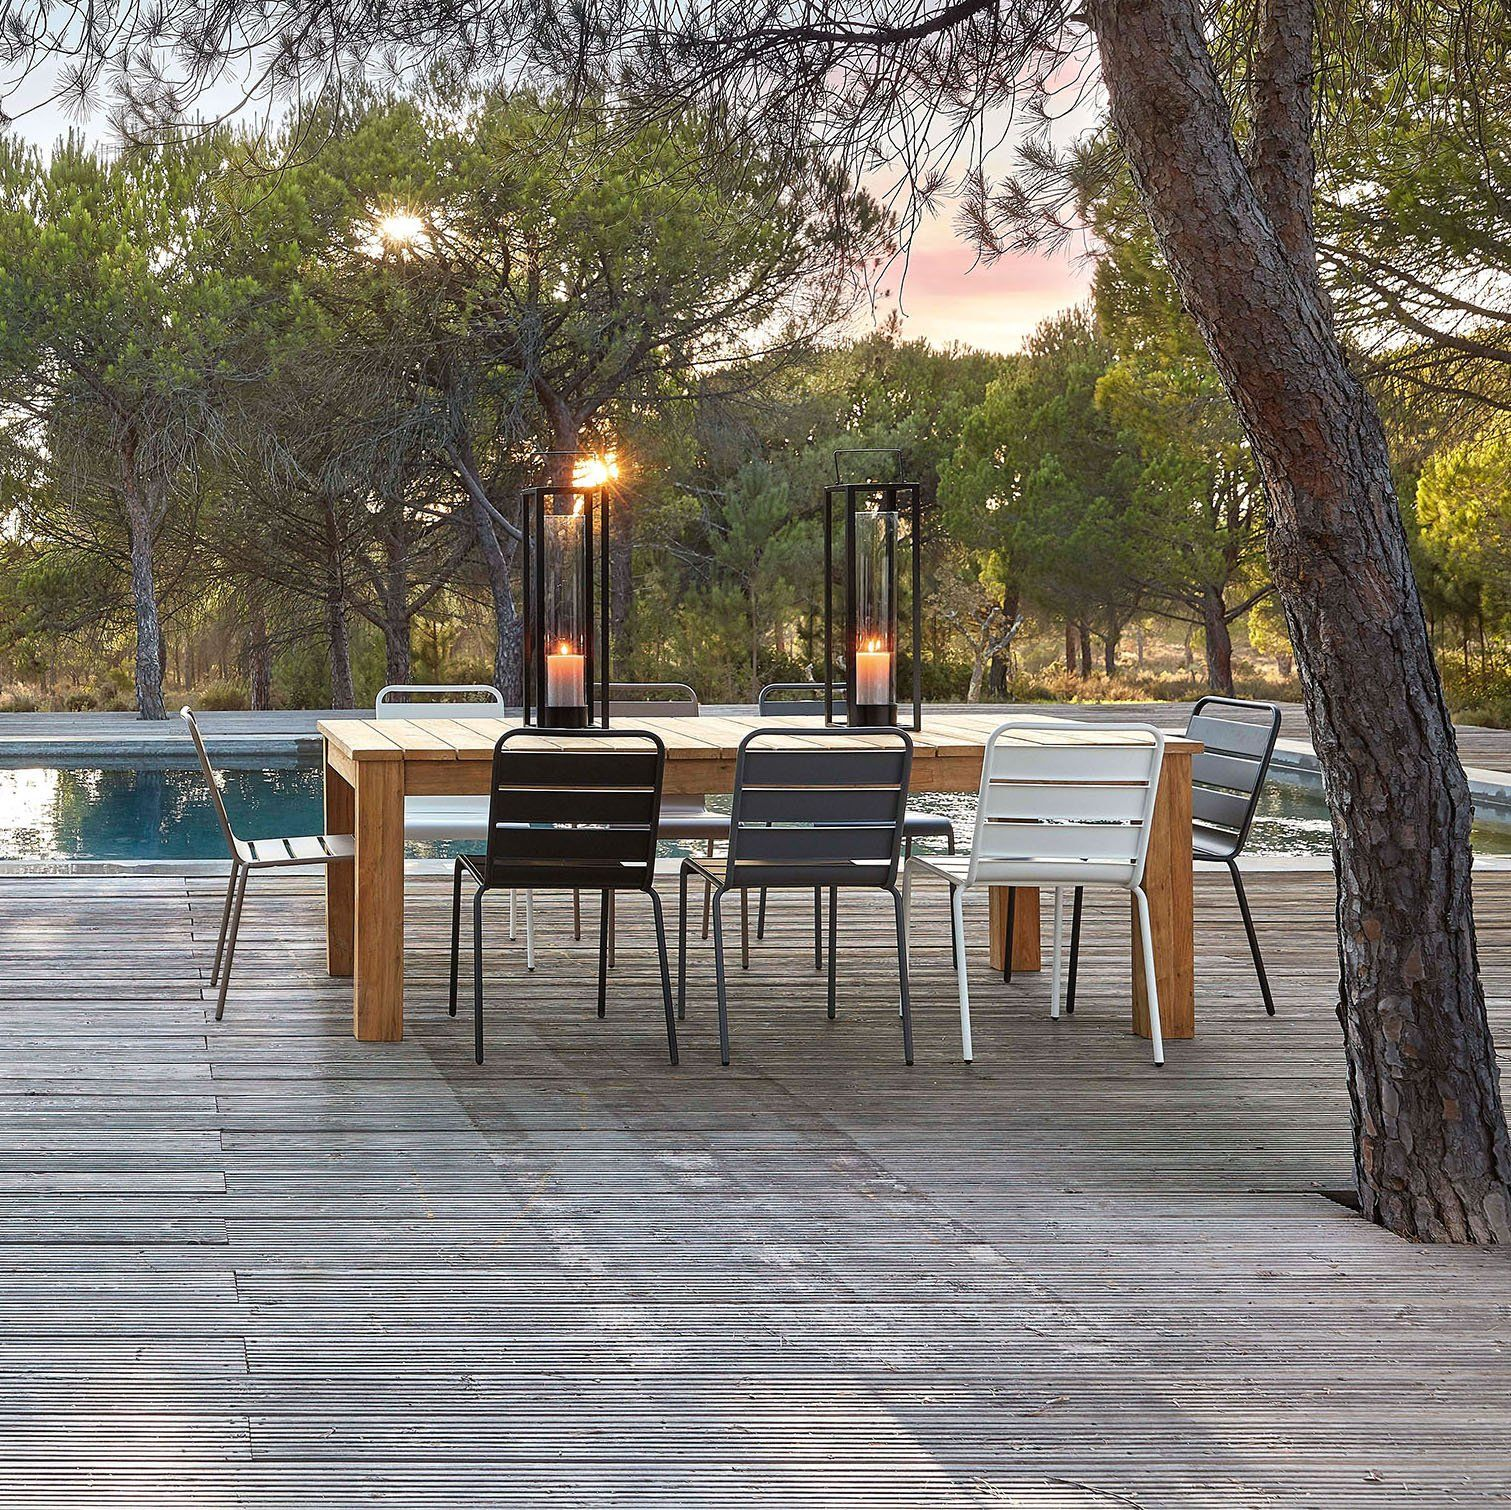 Table De Jardin Design En Teck Avec Chaise En Metal Pour L Exterieur Table De Jardin Table De Jardin Bois Table Jardin Teck